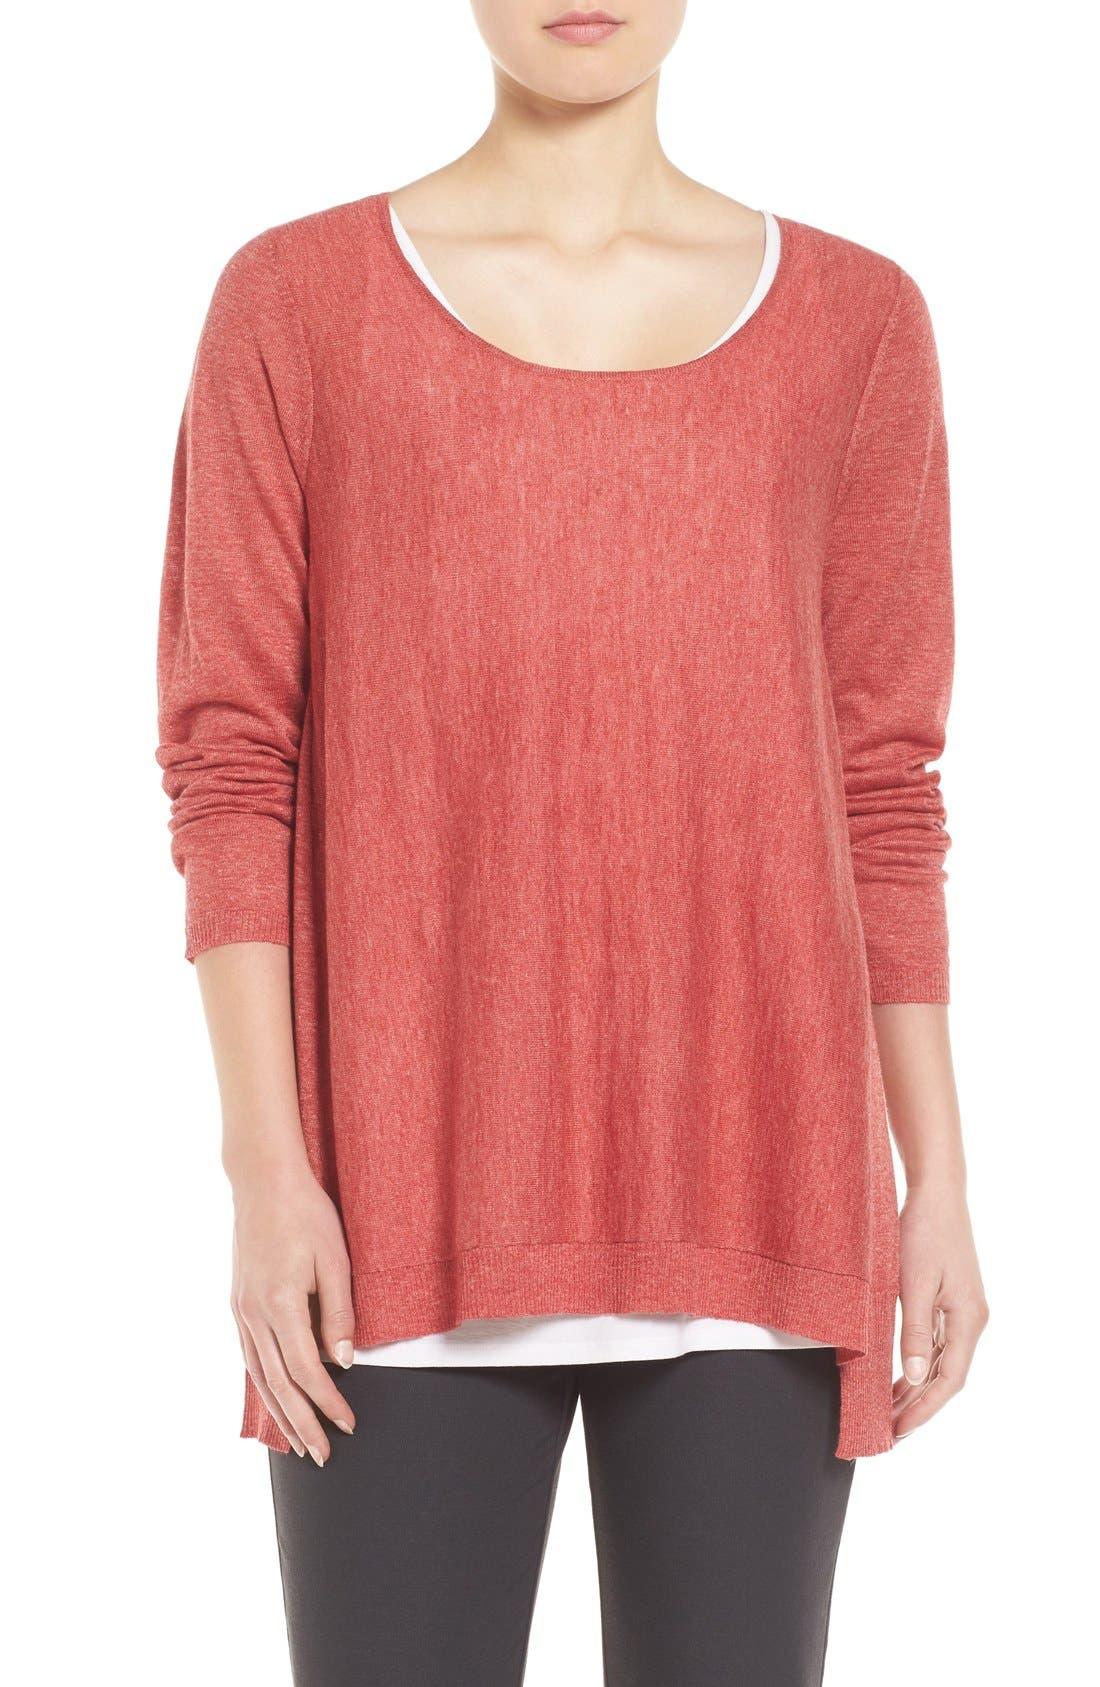 Alternate Image 1 Selected - Eileen Fisher Scoop Neck Sweater (Regular & Petite)